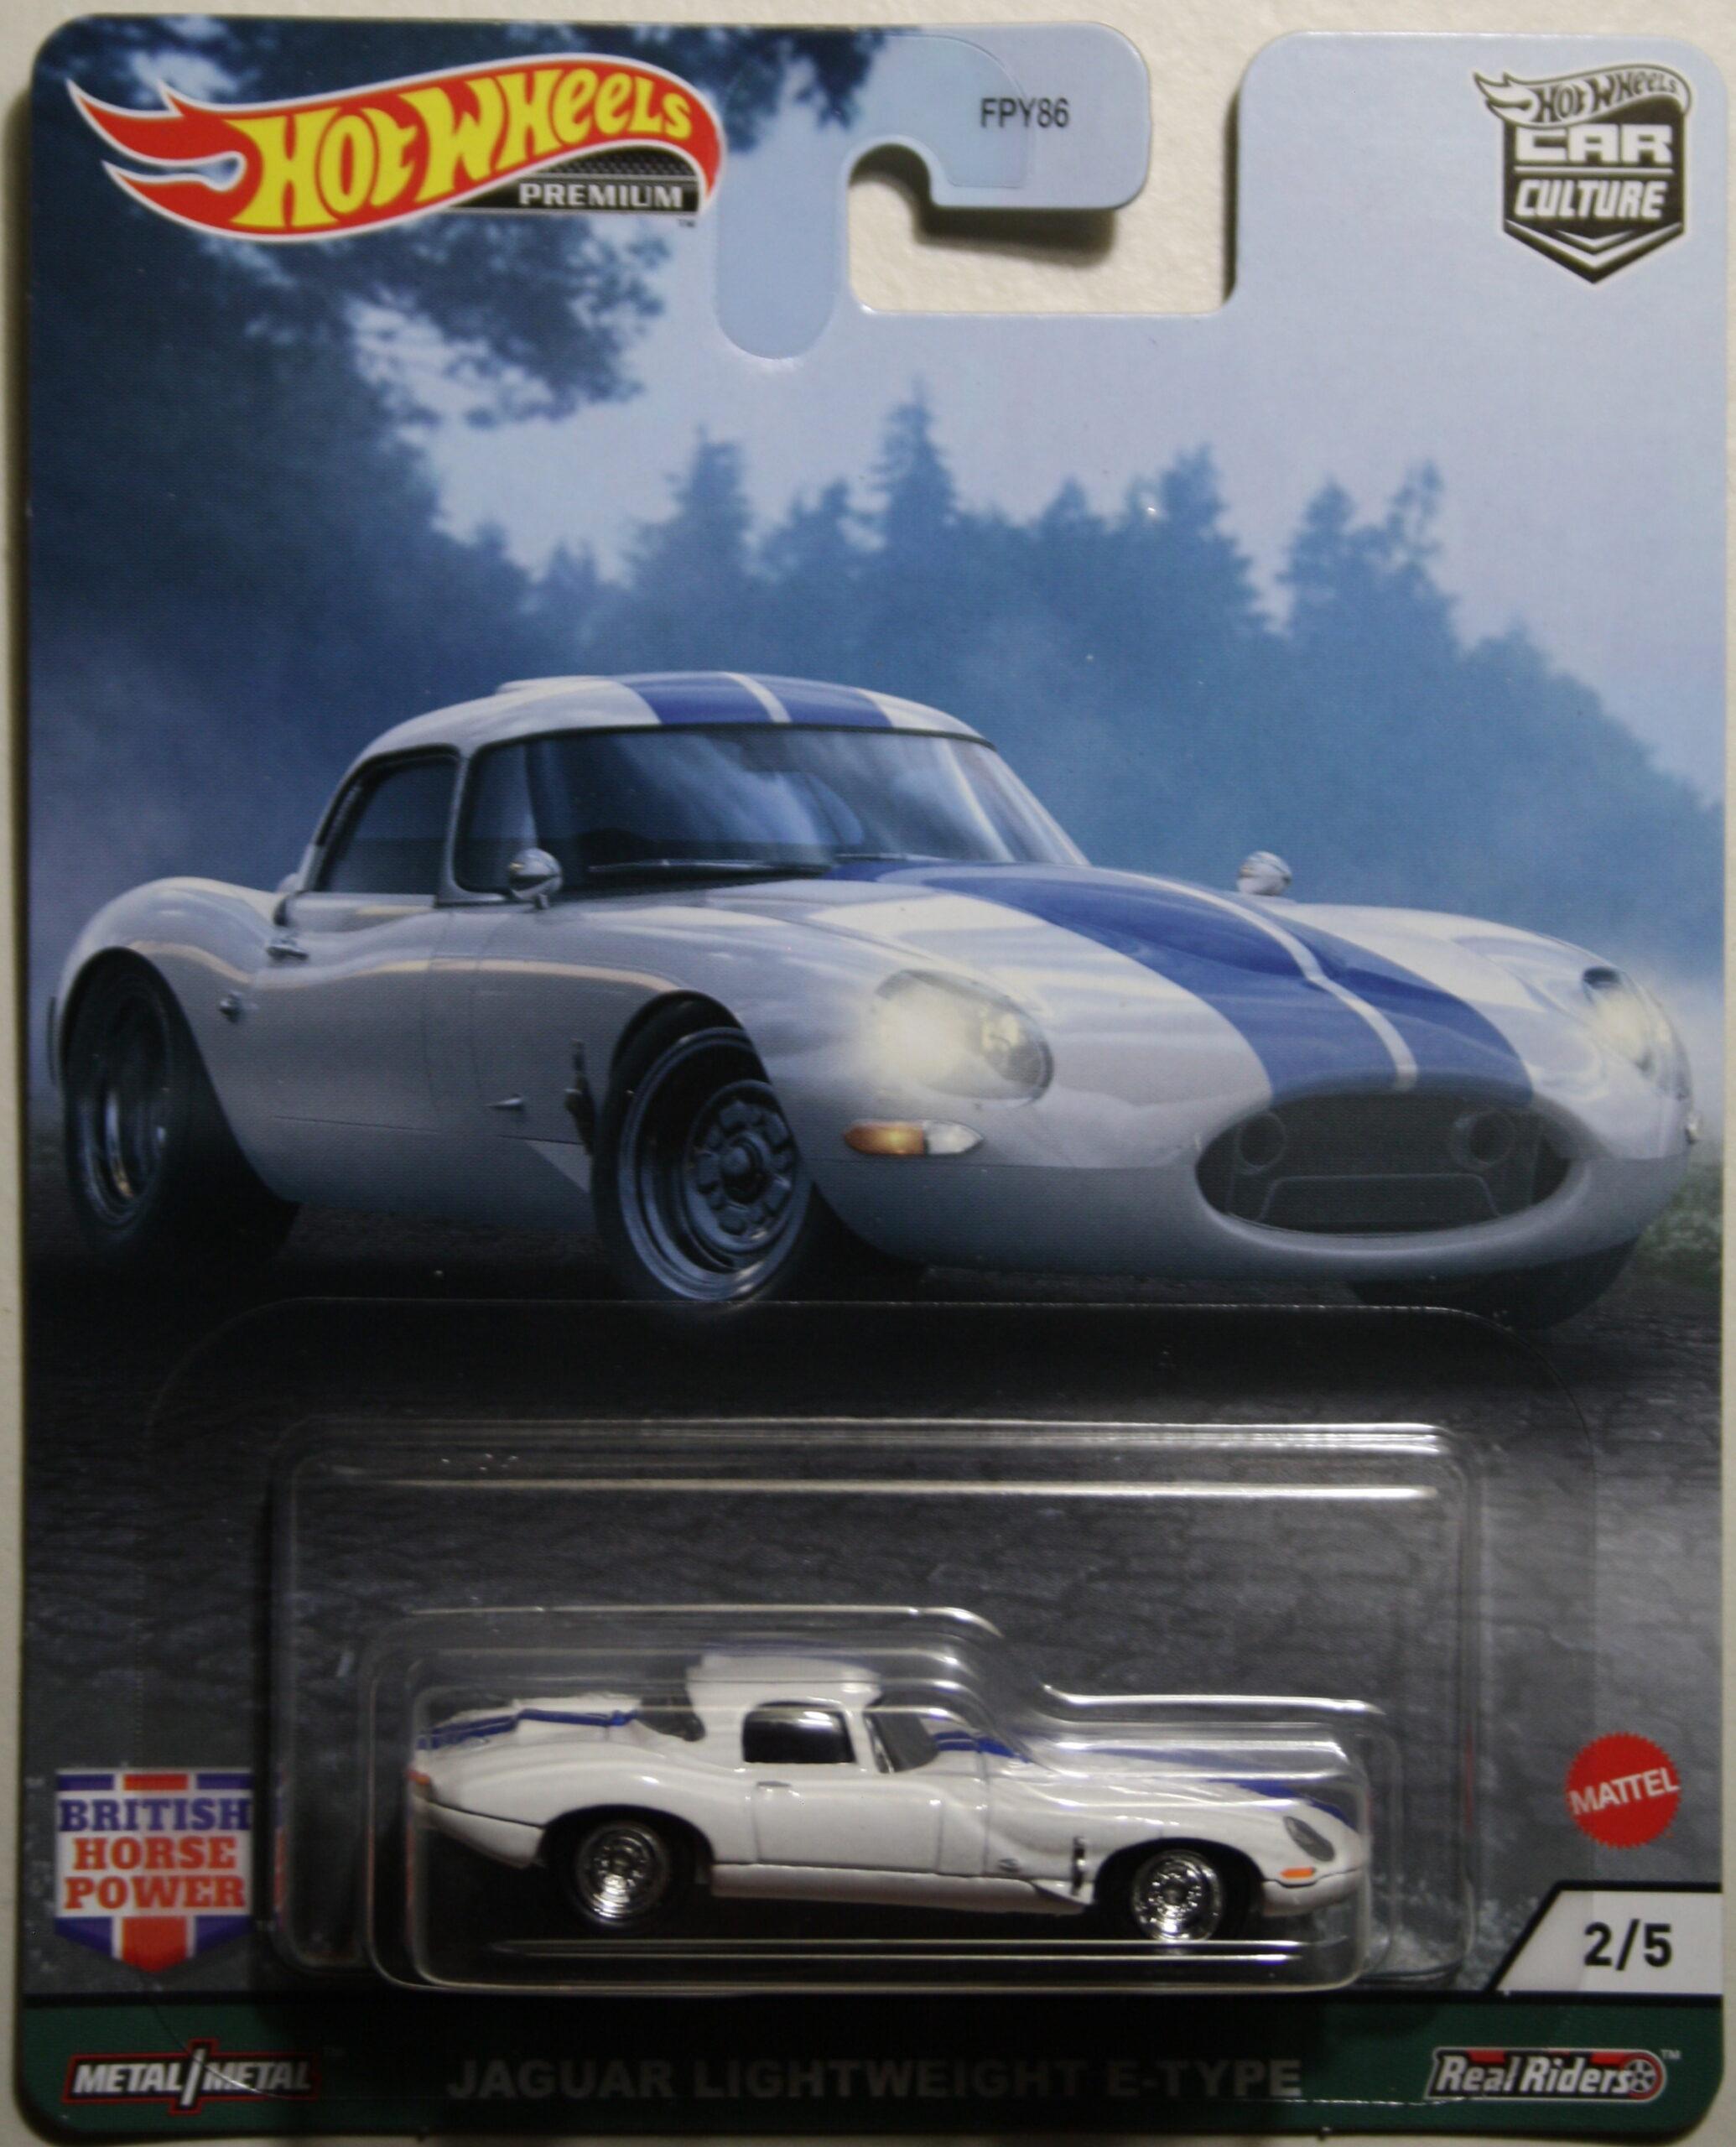 Hot Wheels Car Culture Jaguar Lightweight E-type white